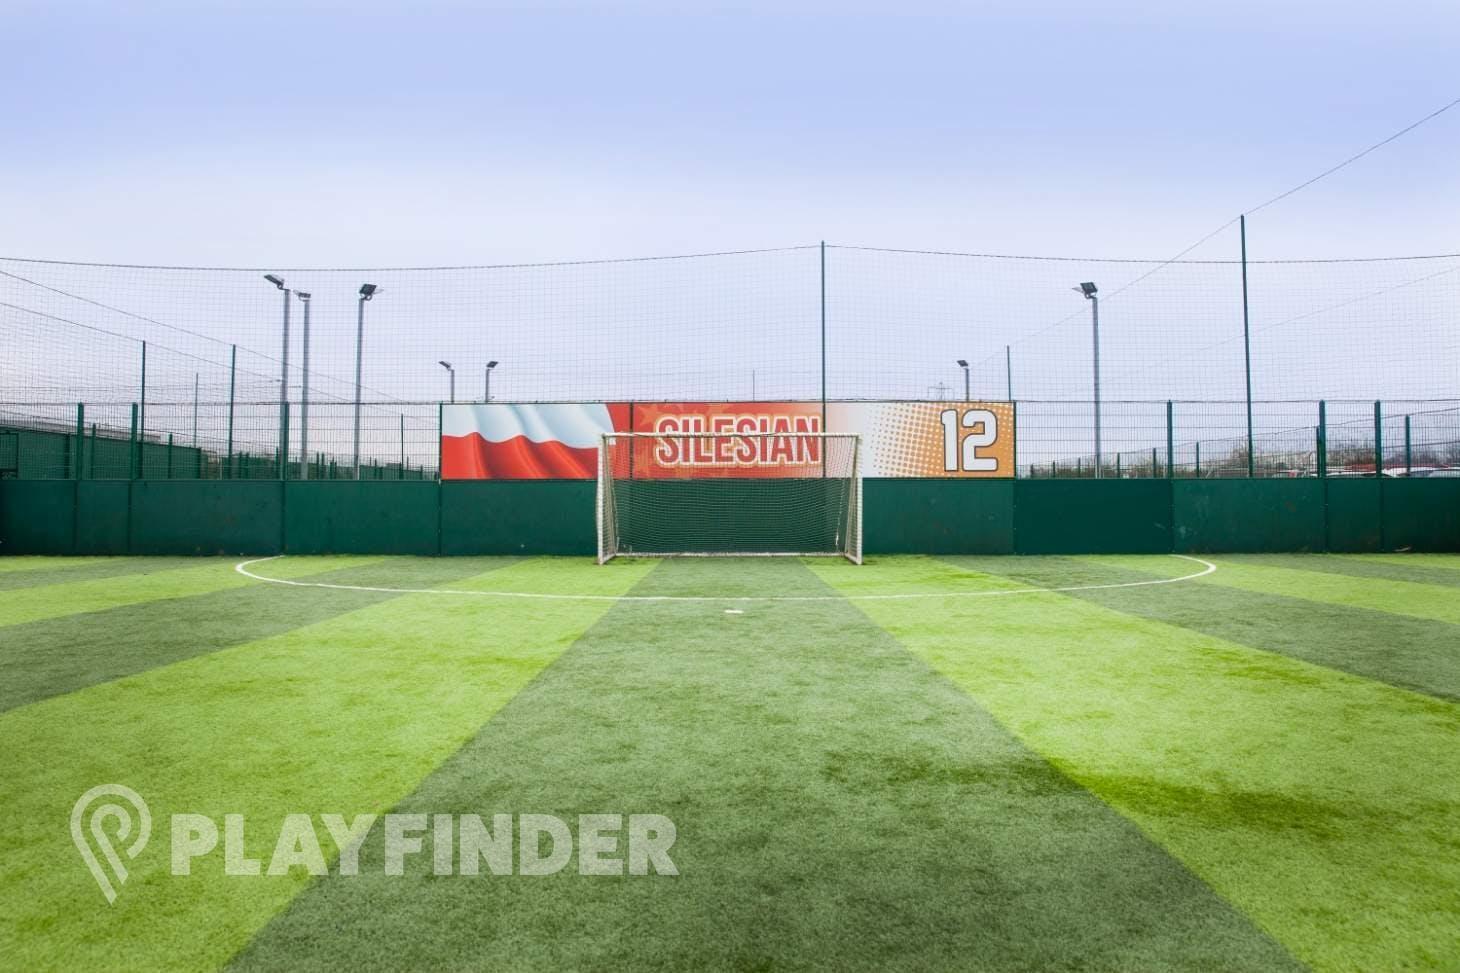 Goals Dartford 8 a side | 3G Astroturf football pitch